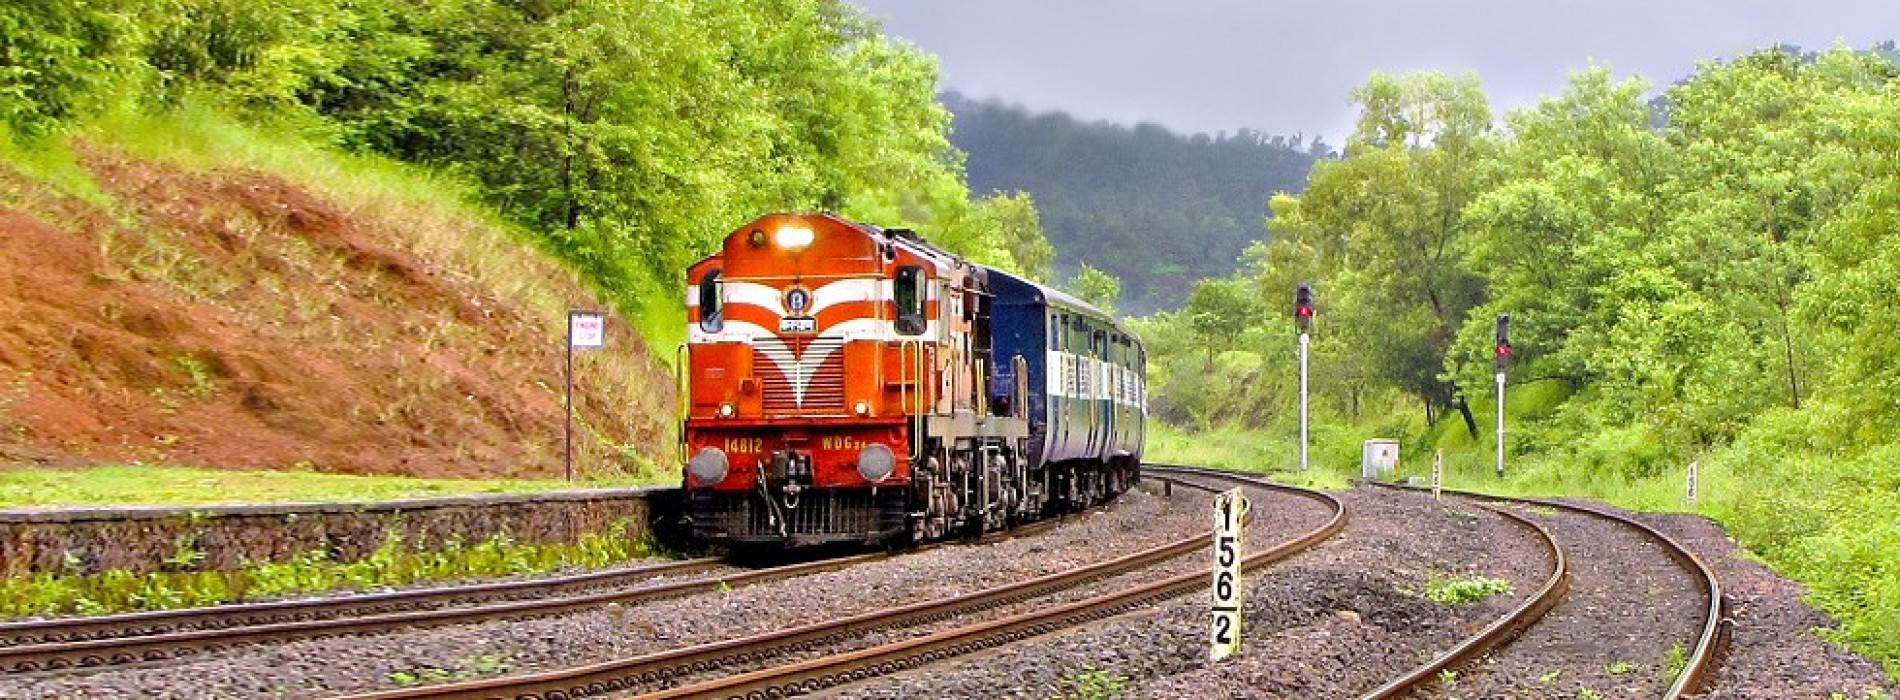 Railways seek security for India's first solar train